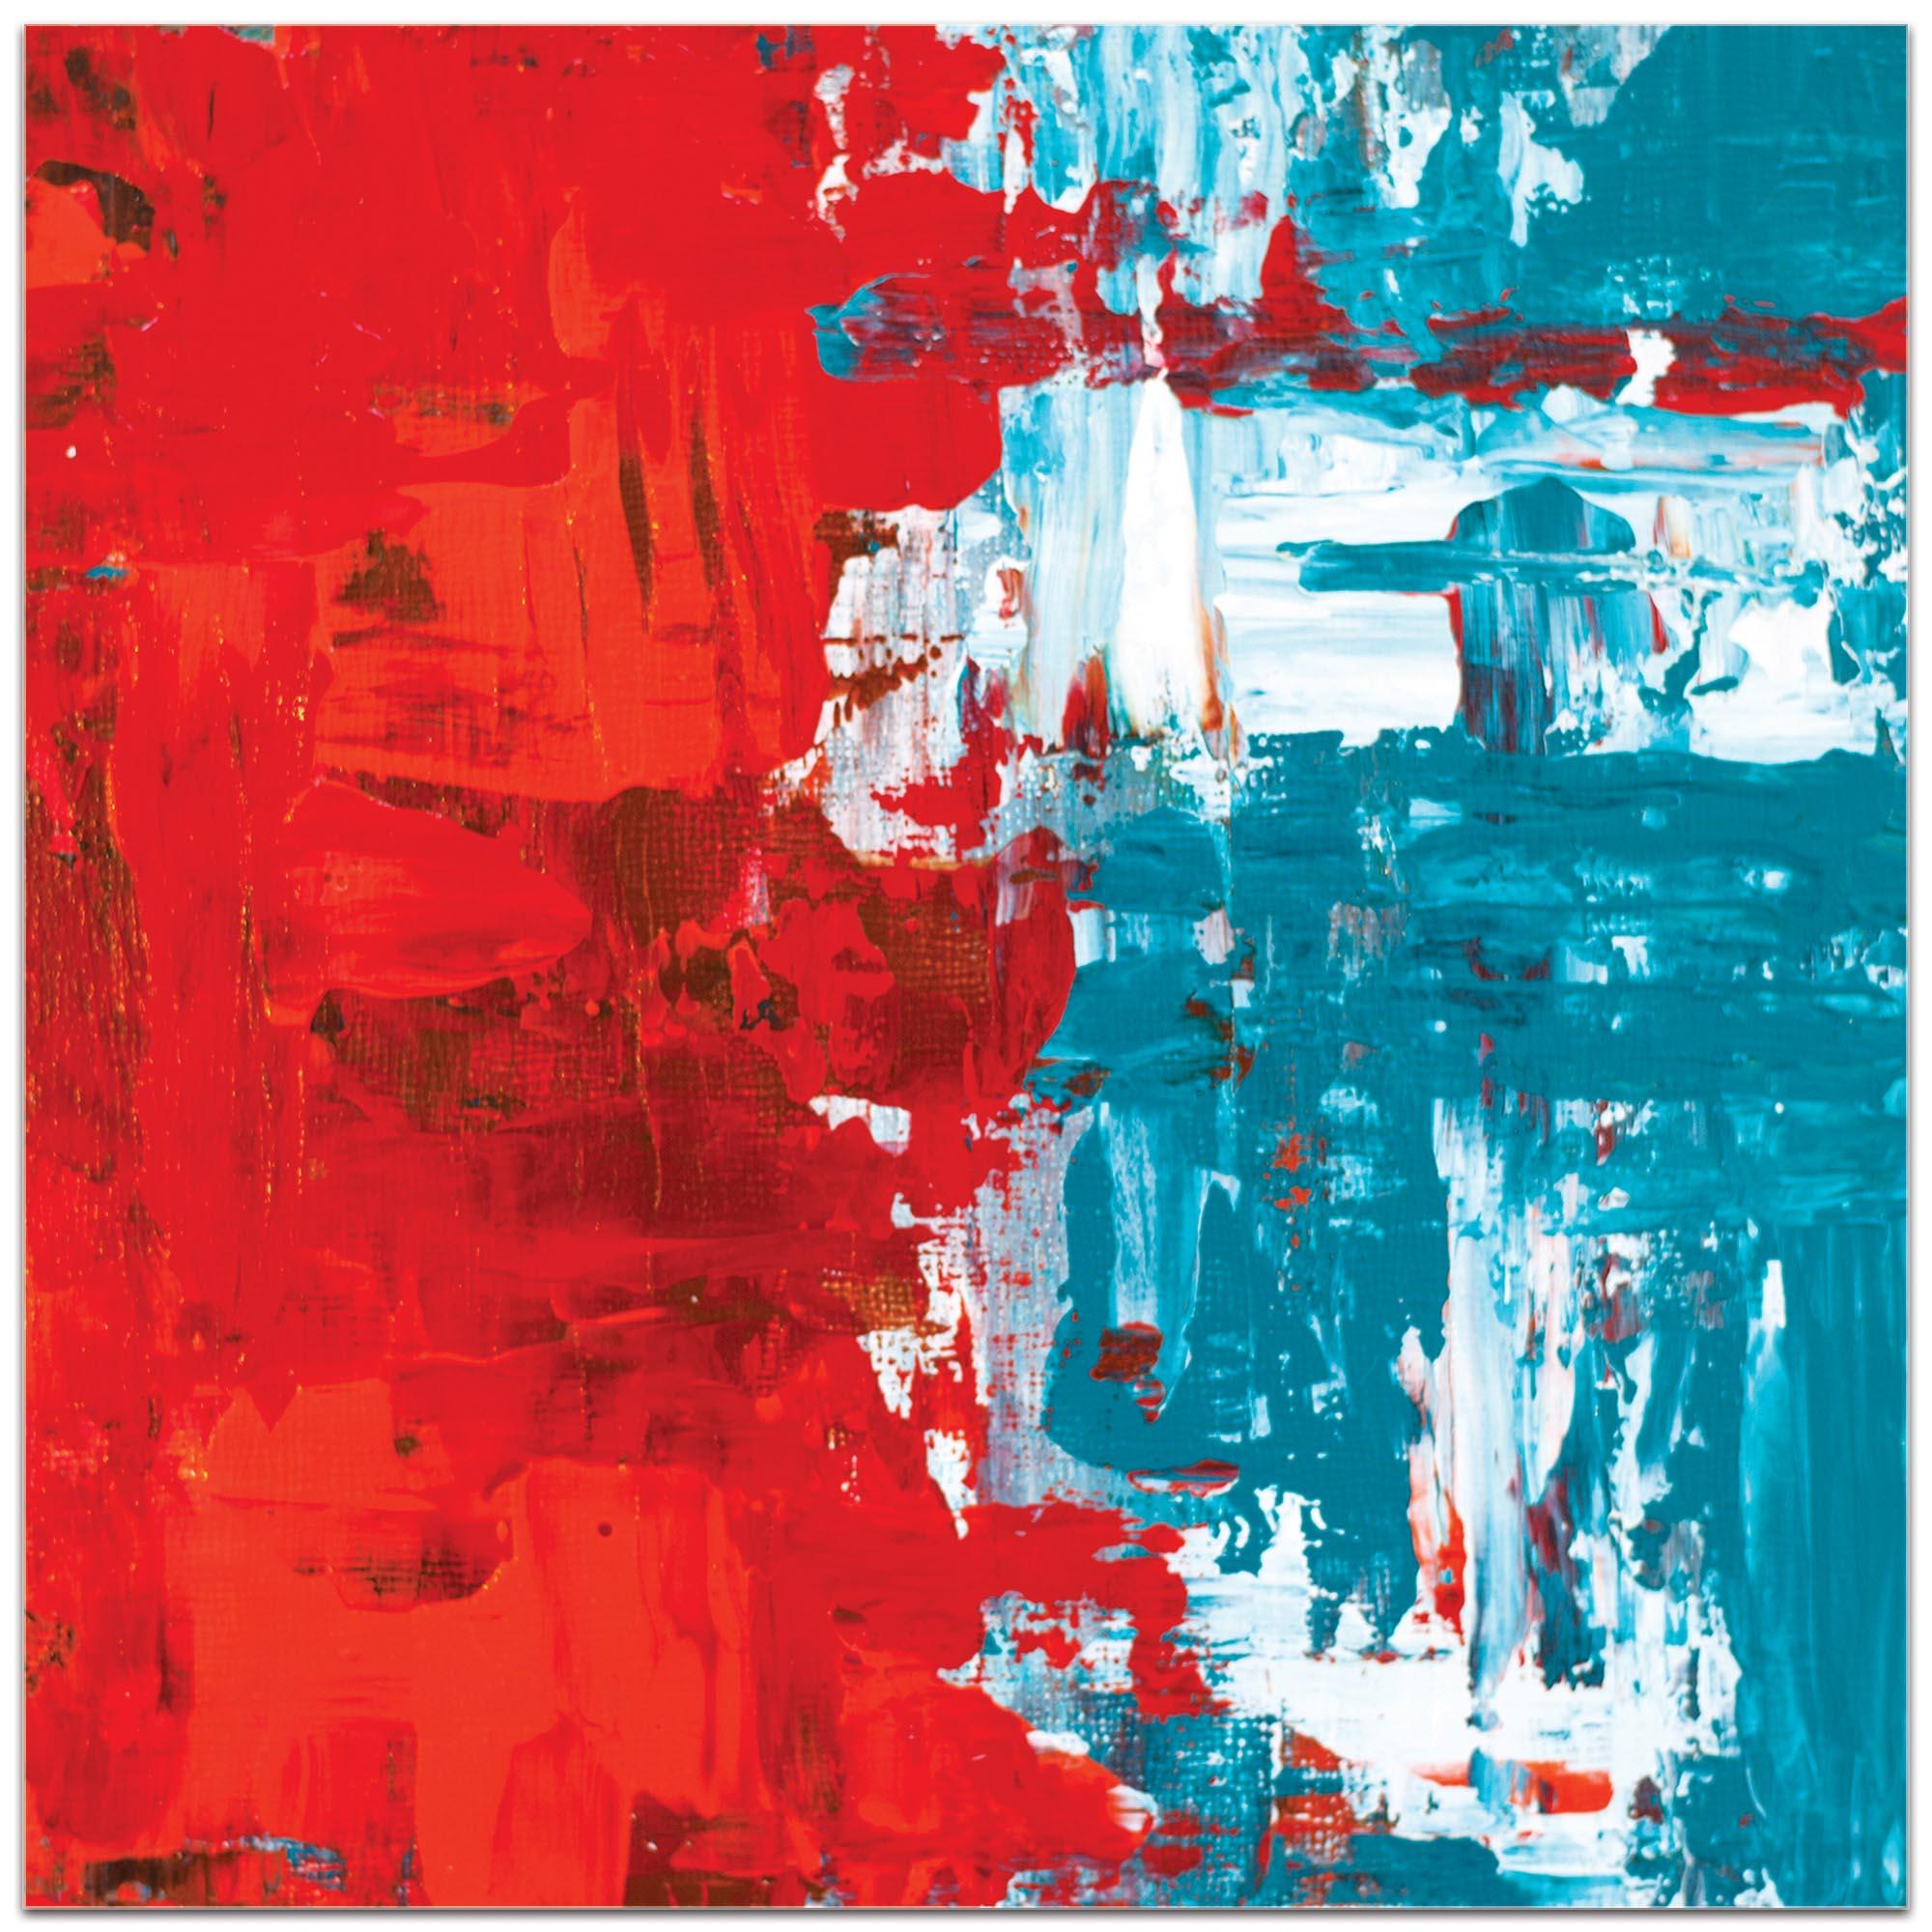 Abstract Wall Art 'Urban Life 13' - Urban Decor on Metal or Plexiglass - Image 2